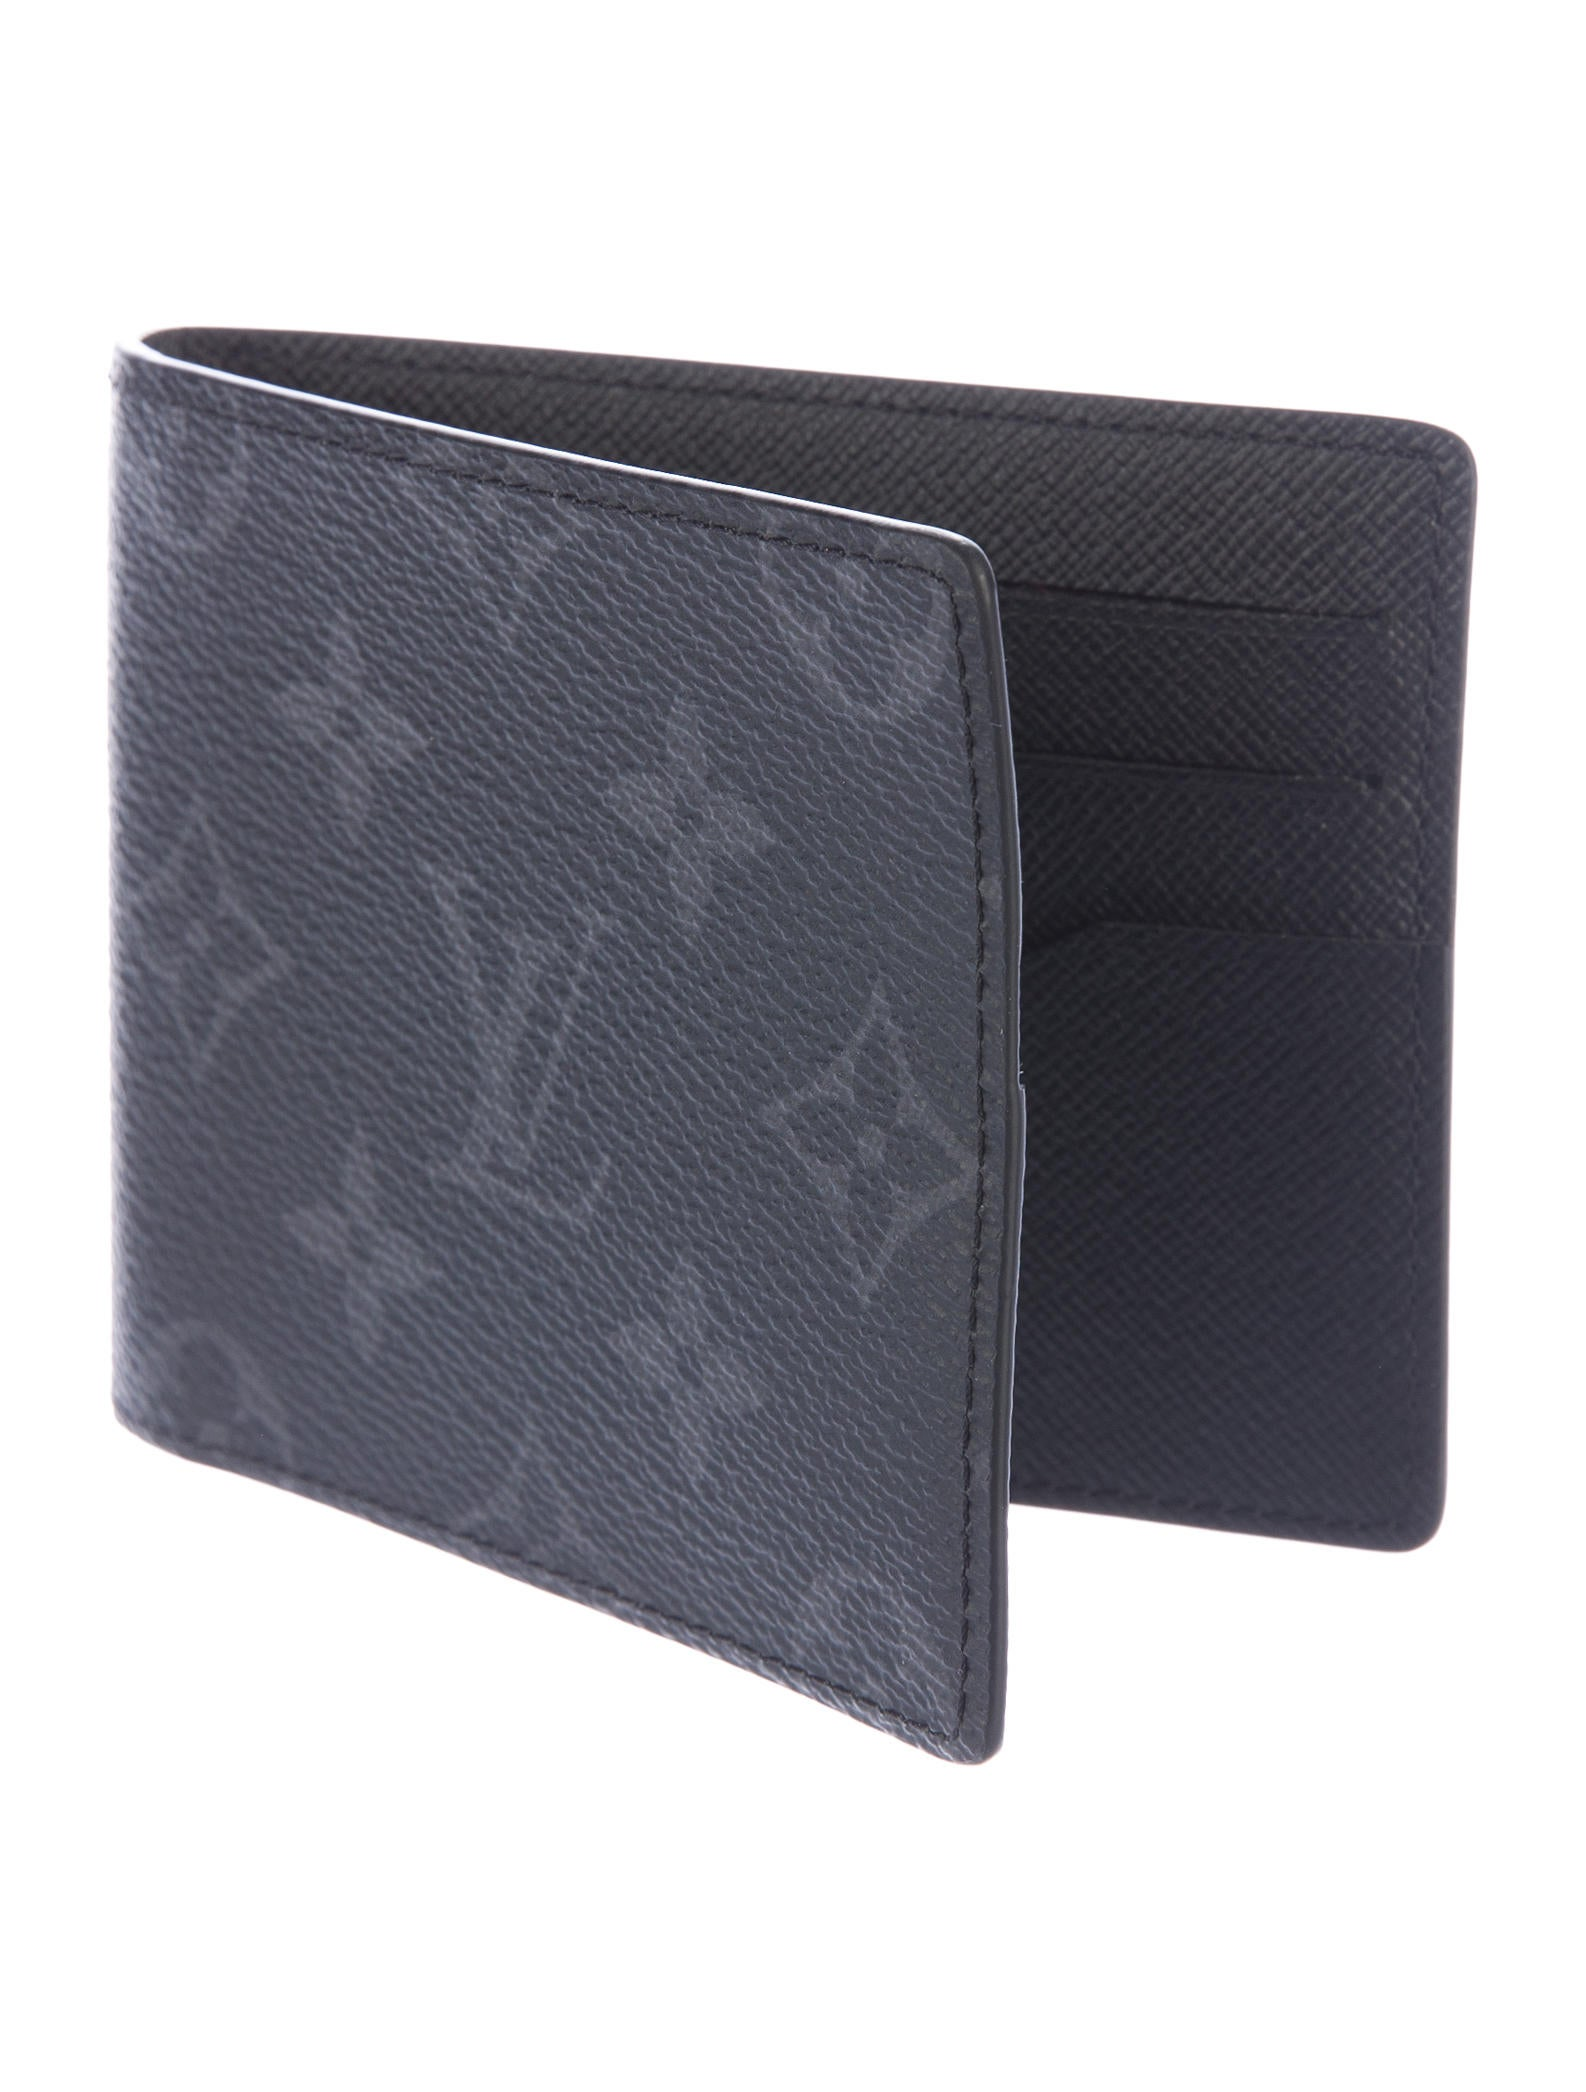 louis vuitton monogram pince wallet accessories. Black Bedroom Furniture Sets. Home Design Ideas